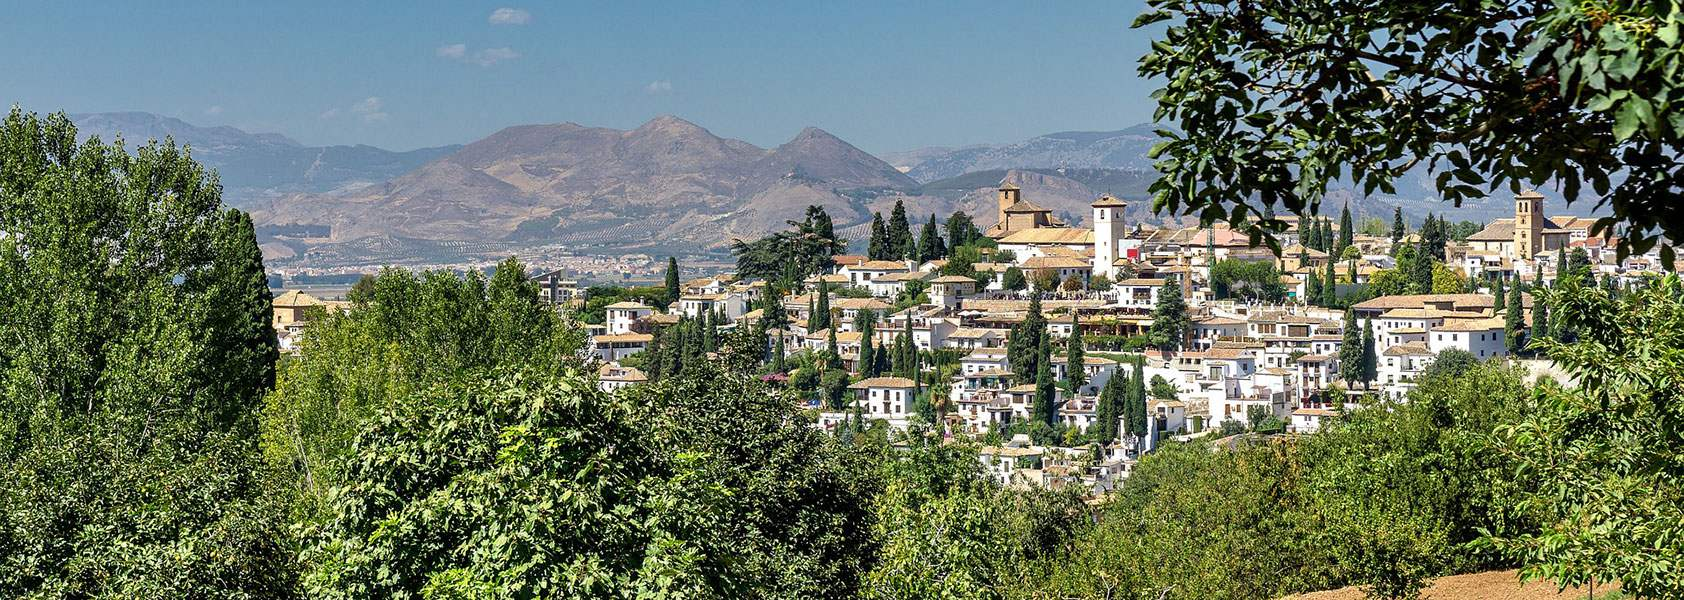 Single Reis Spanje | Wandelen langs de bergen van Andalusië